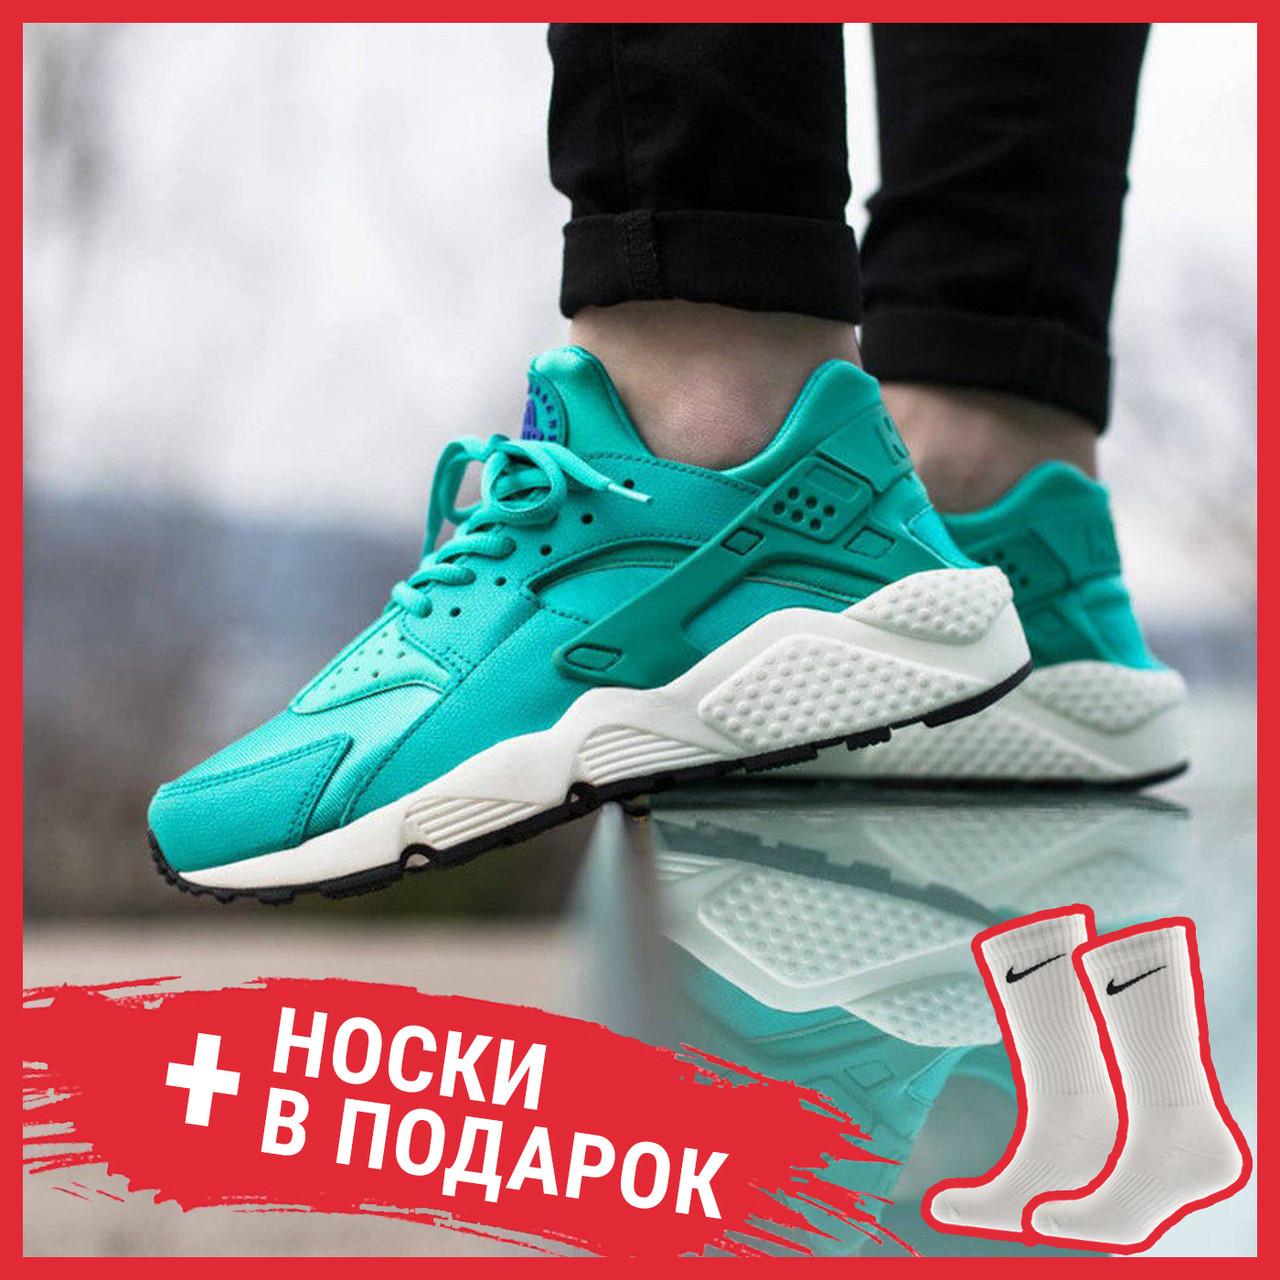 Женские кроссовки Nike Air Huarache Run Rio Teal/Rio Teal/Black 634835 301, Найк Аир Хуарачи